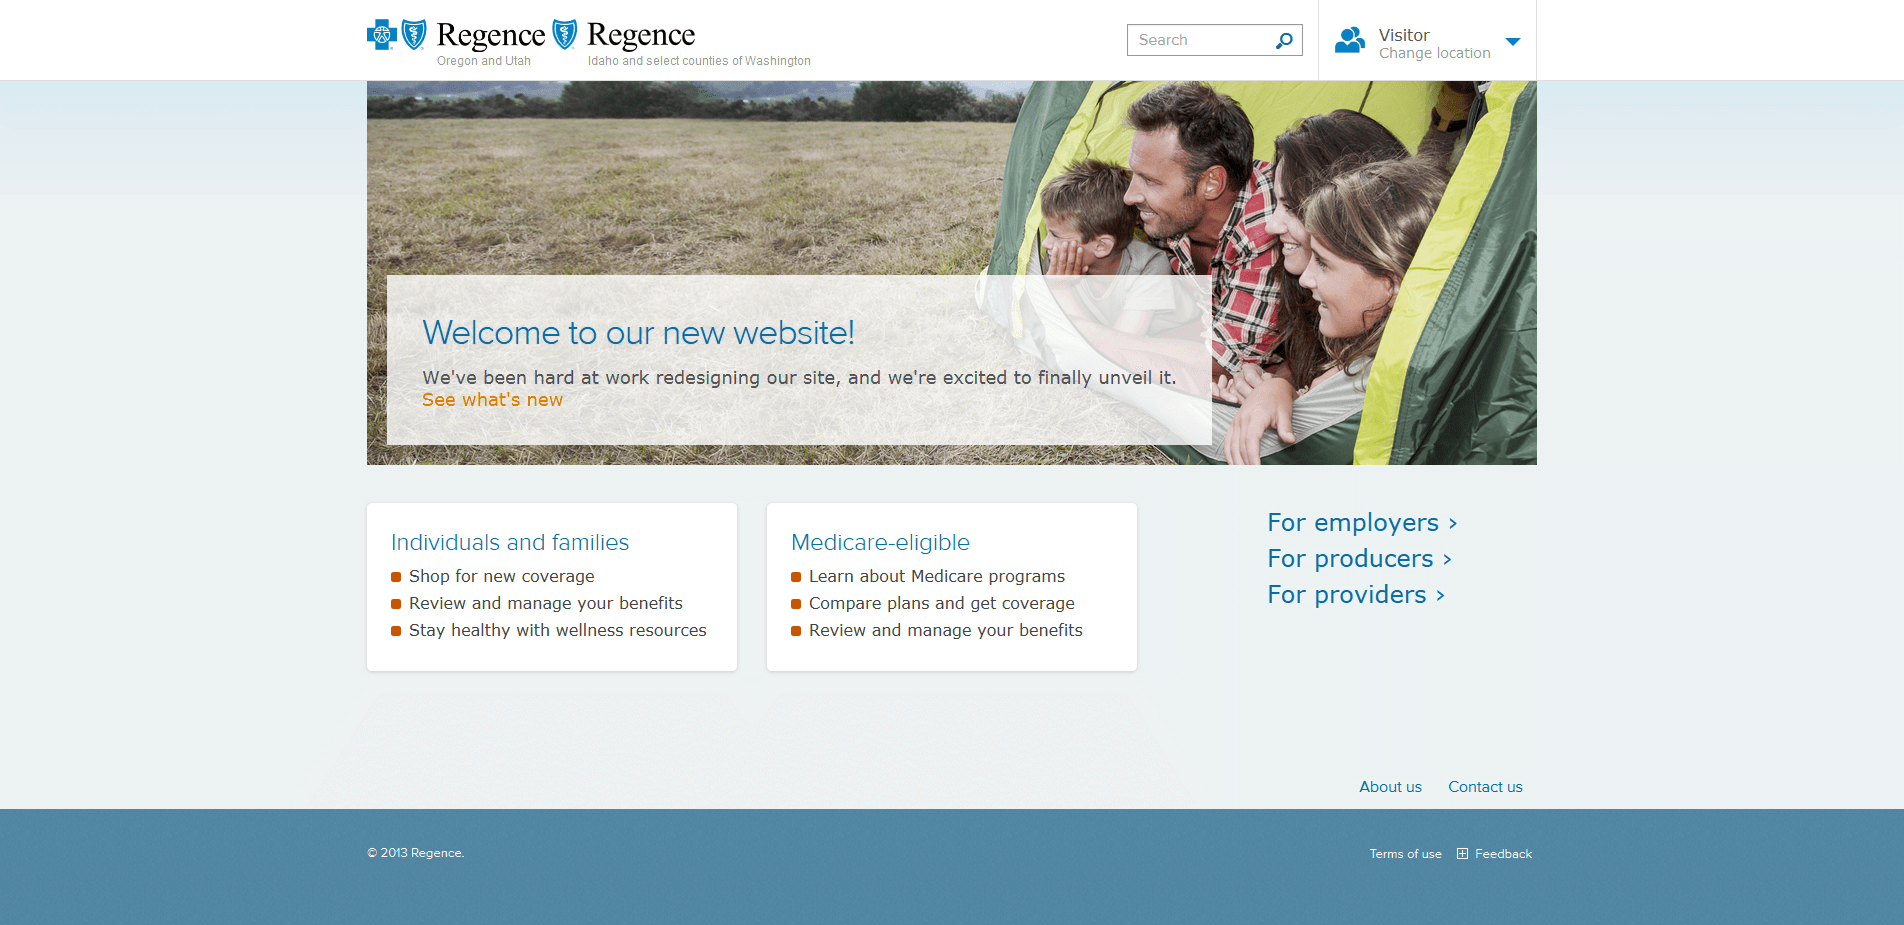 Regence Portal (BlueCross BlueShield) home page